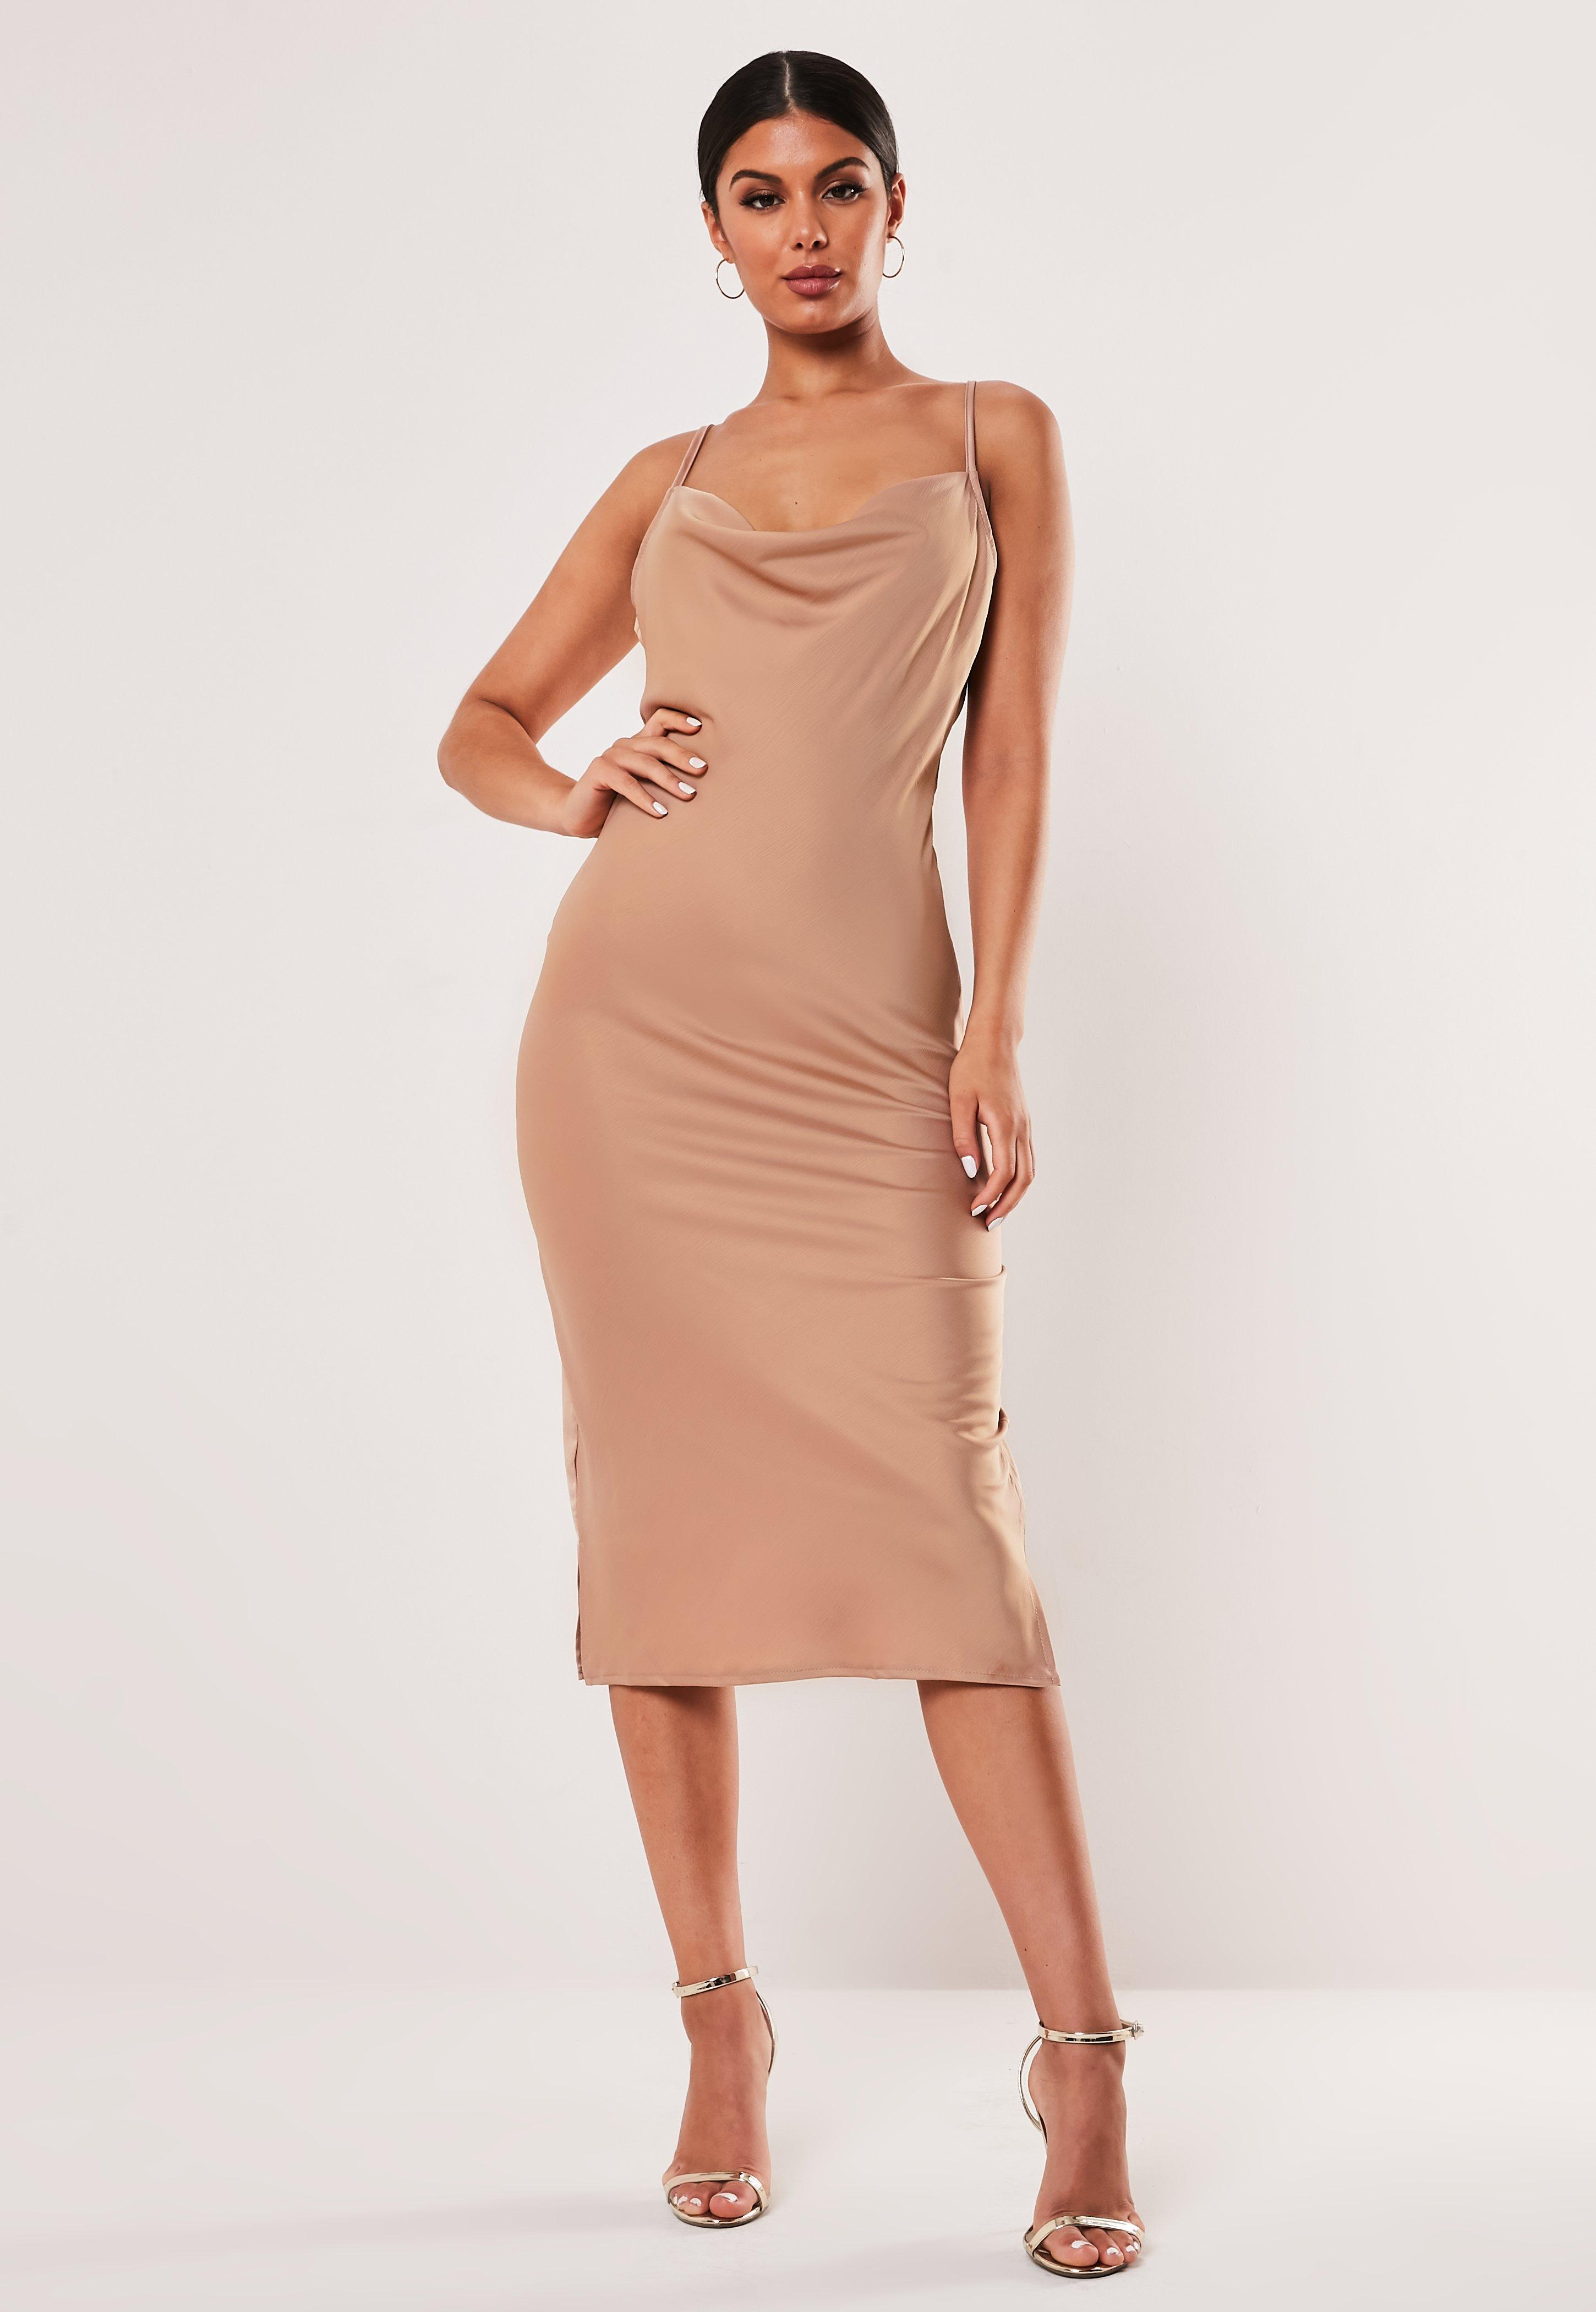 76458bc98d2214 Formal Dresses   Prom Dresses Online - Missguided Australia